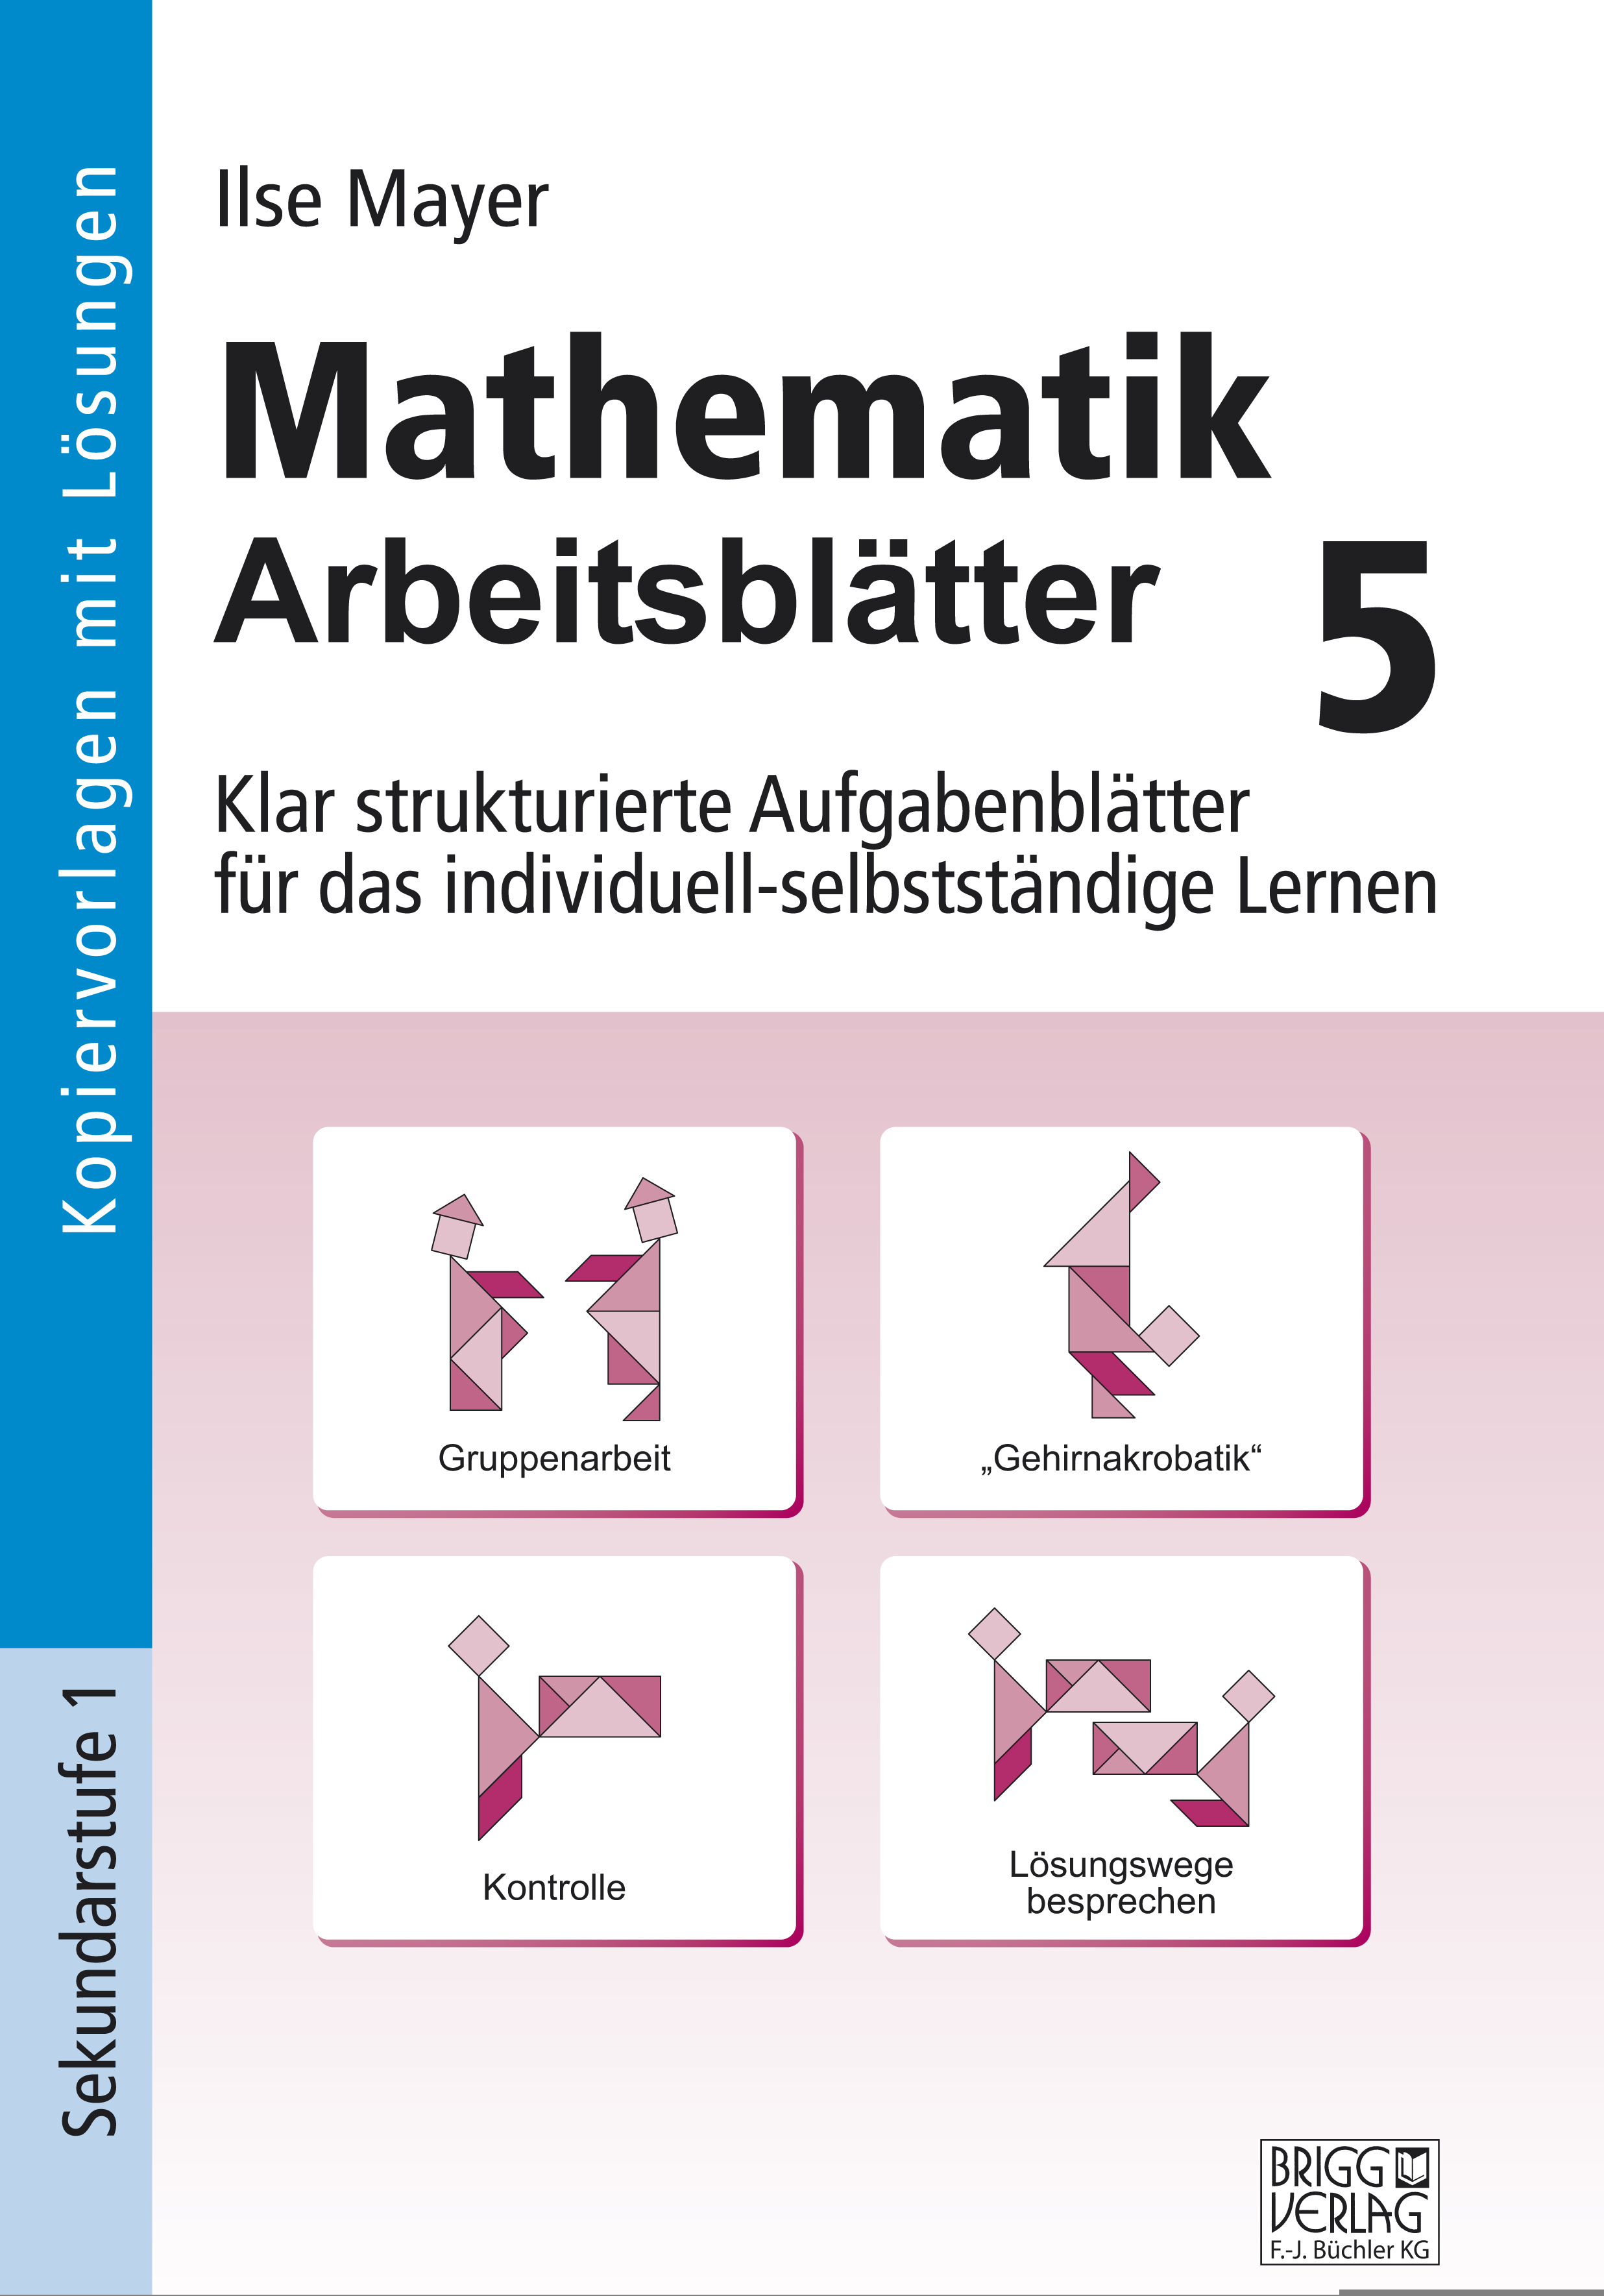 Mathematik Arbeitsblätter 5 von Mayer, Ilse: Klar strukturierte Aufga